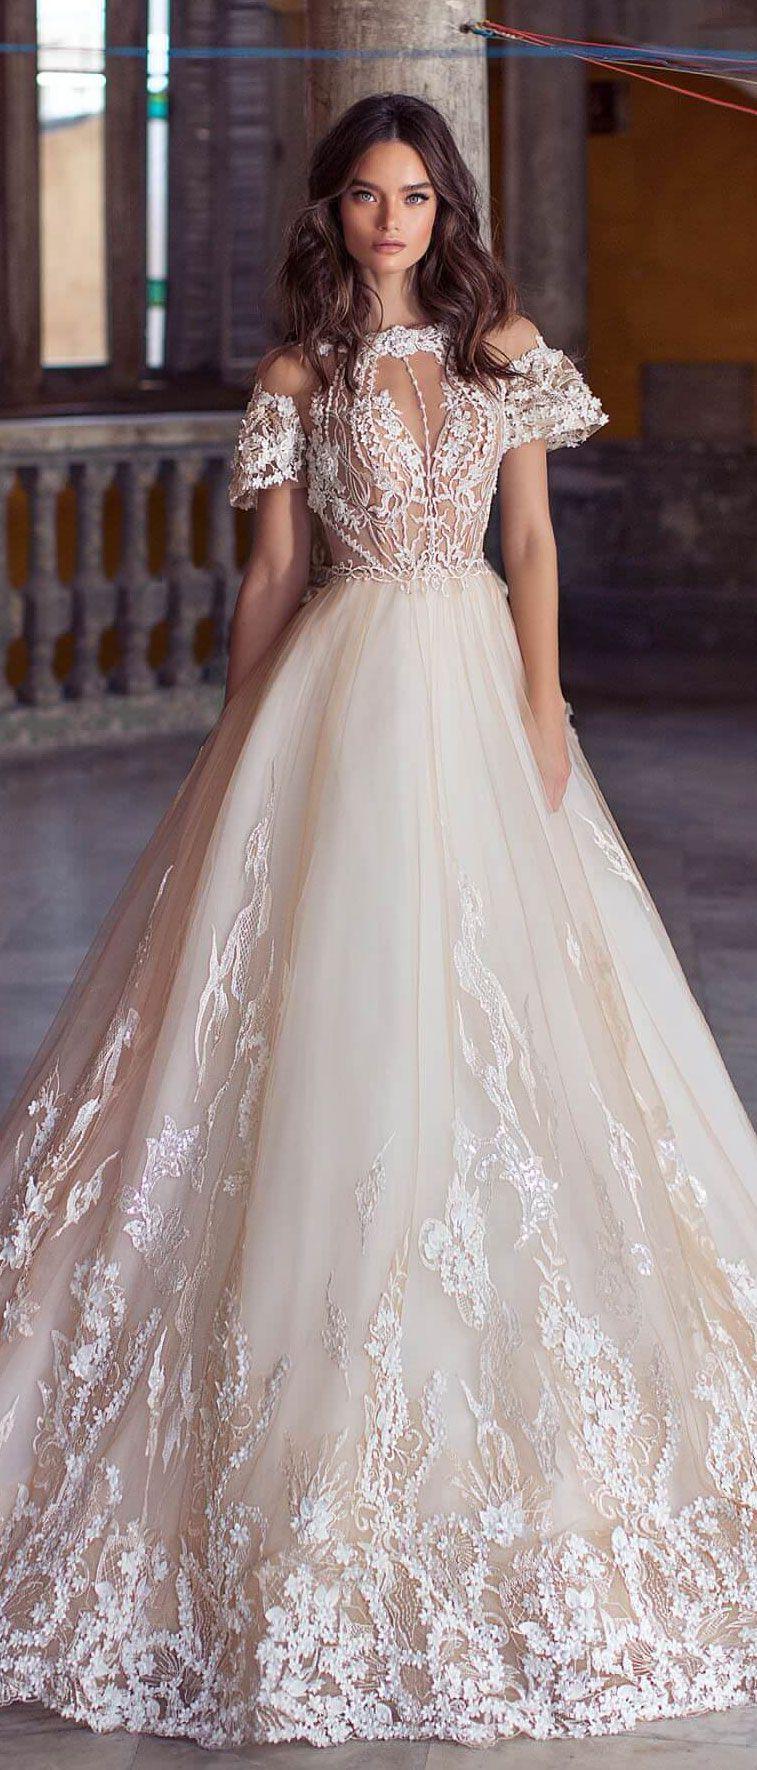 Wedding Dress Inspiration #weddingdress